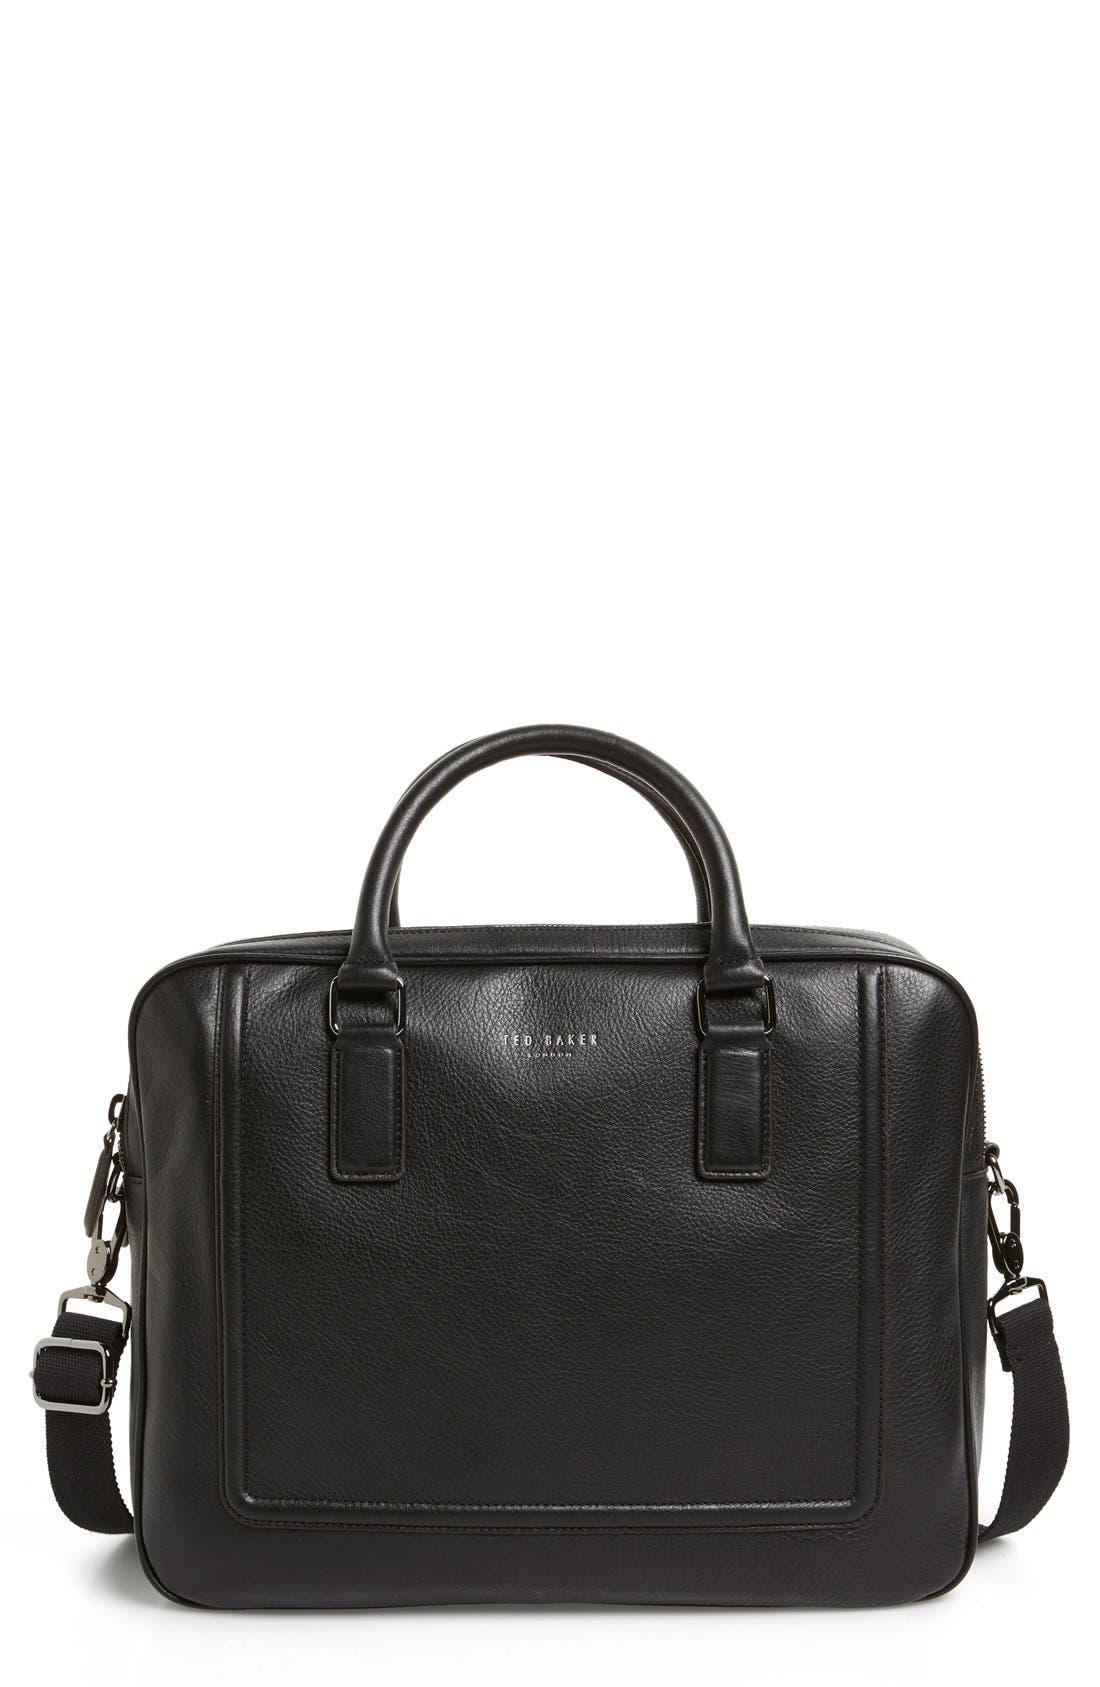 'Ragna' Leather Bowler Bag,                             Alternate thumbnail 6, color,                             001